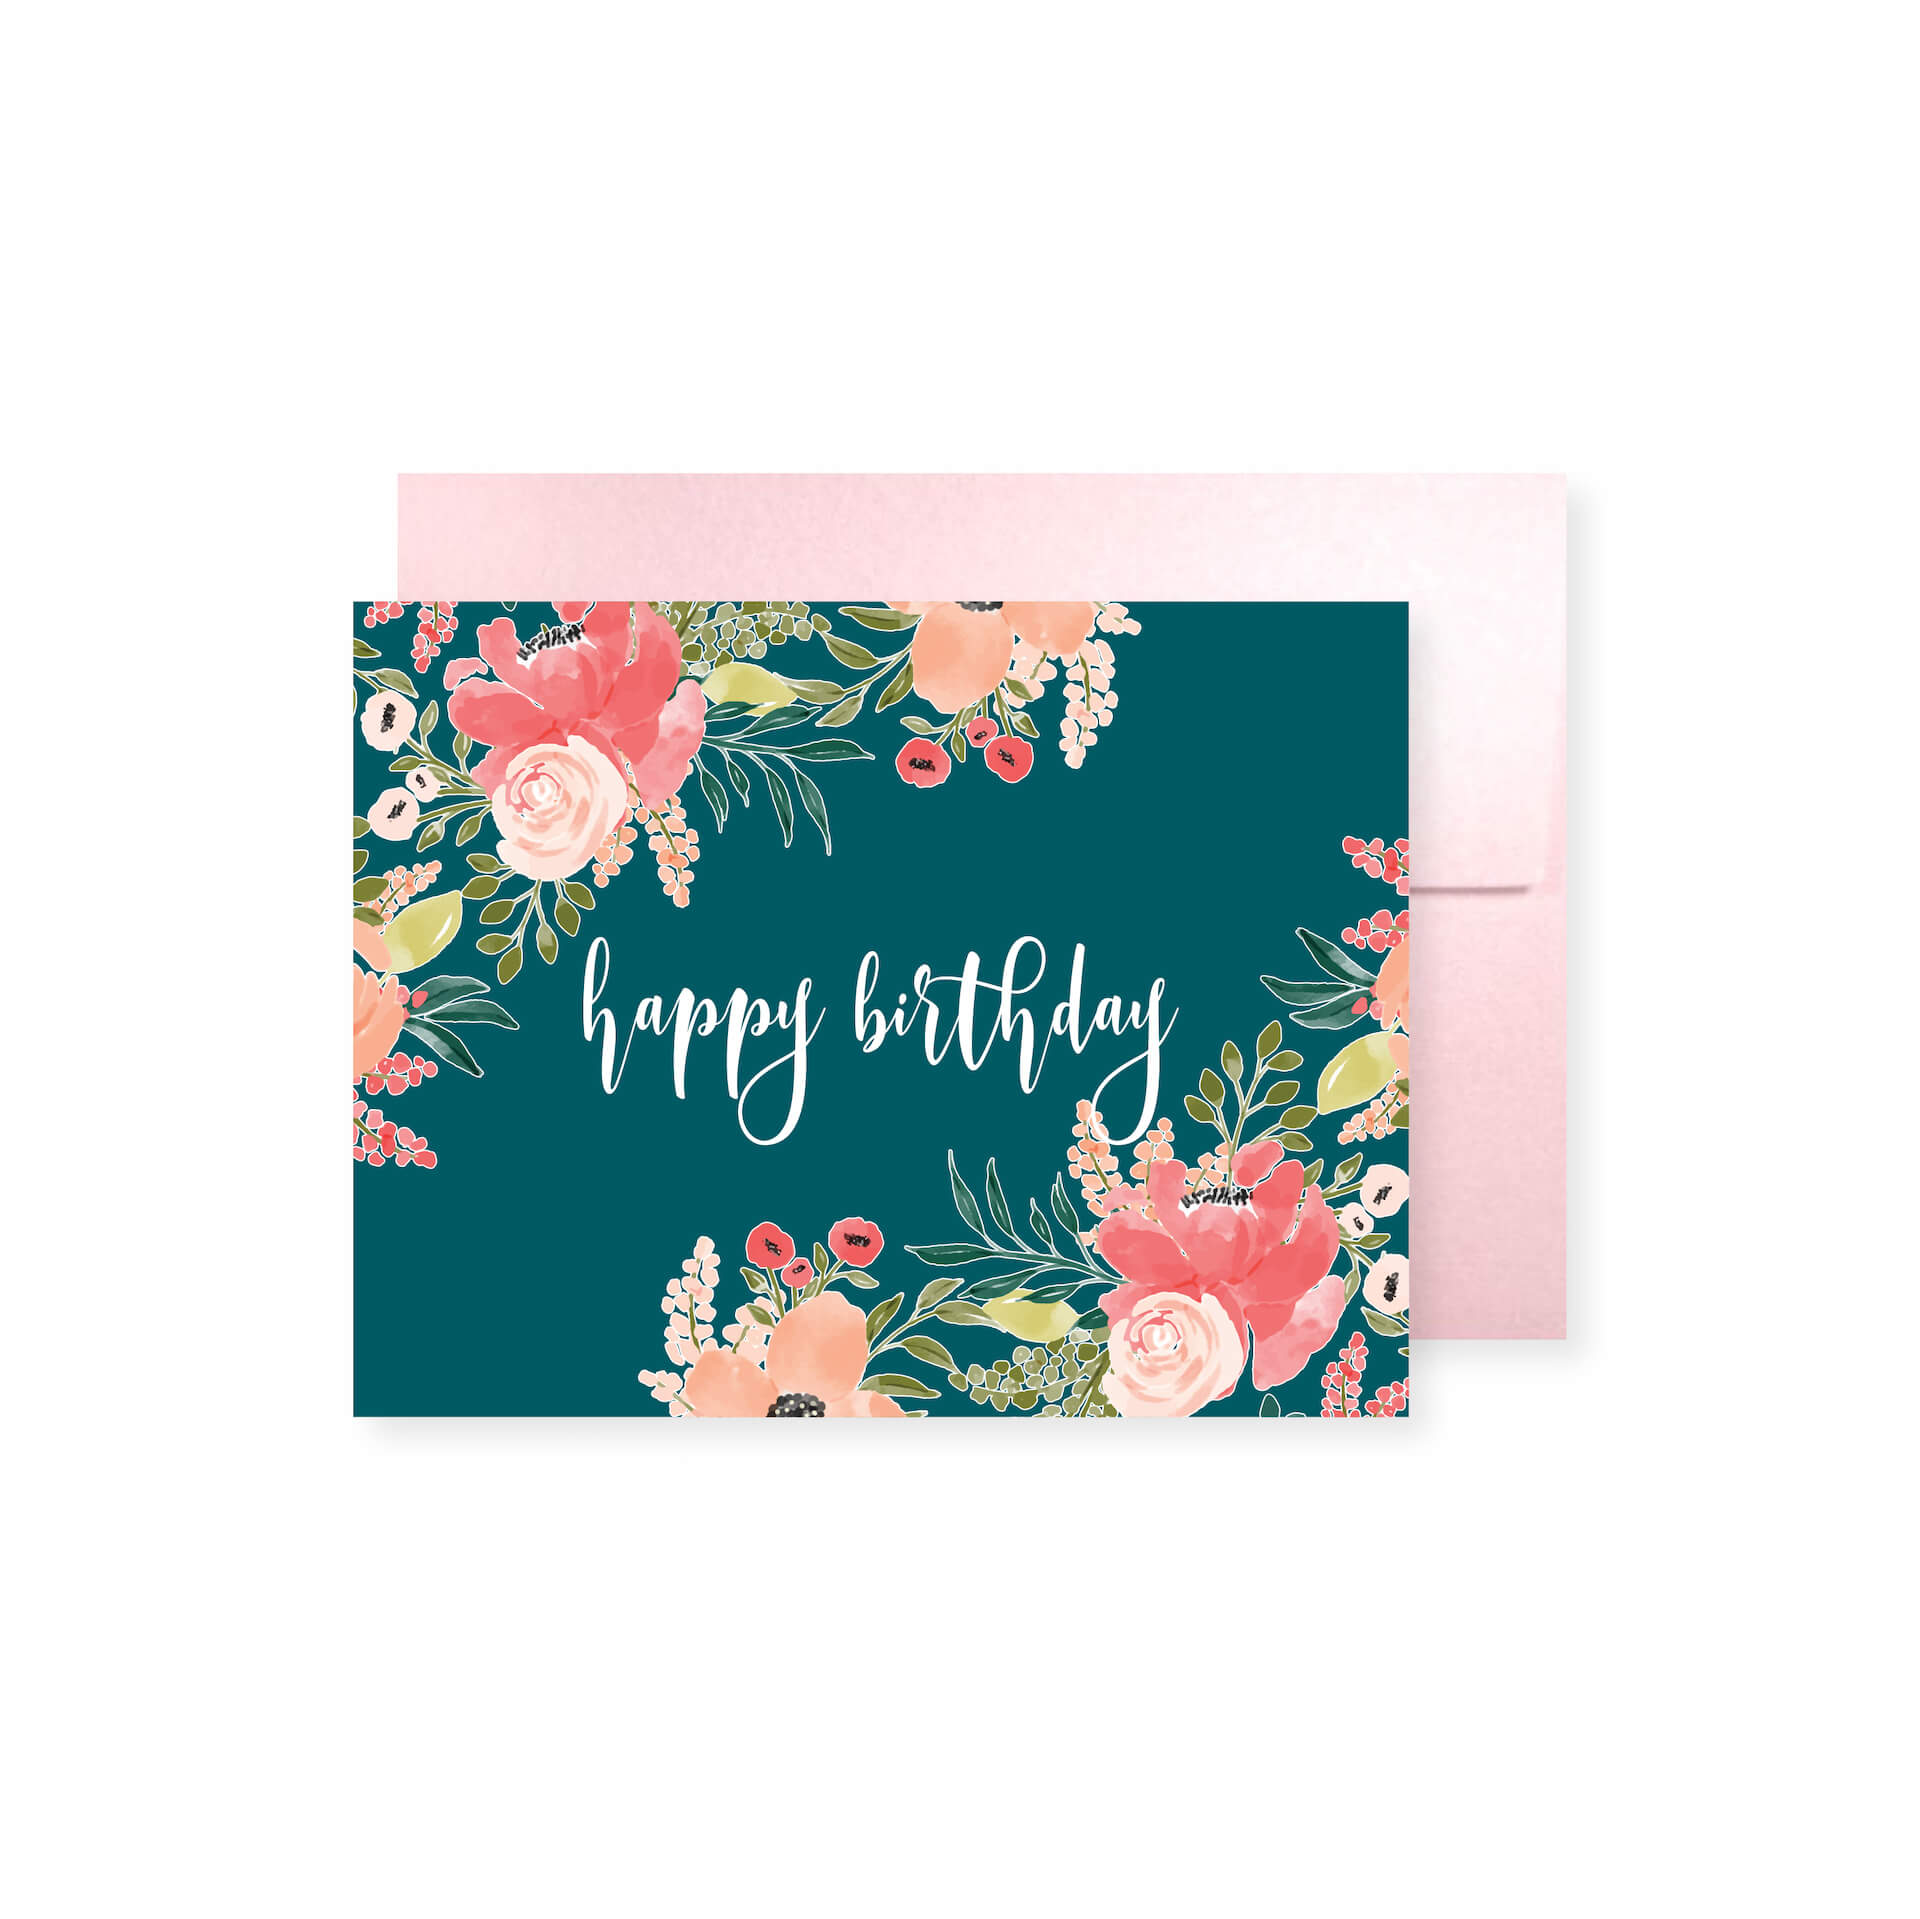 Peach & Posey Birthday Card-01.jpg